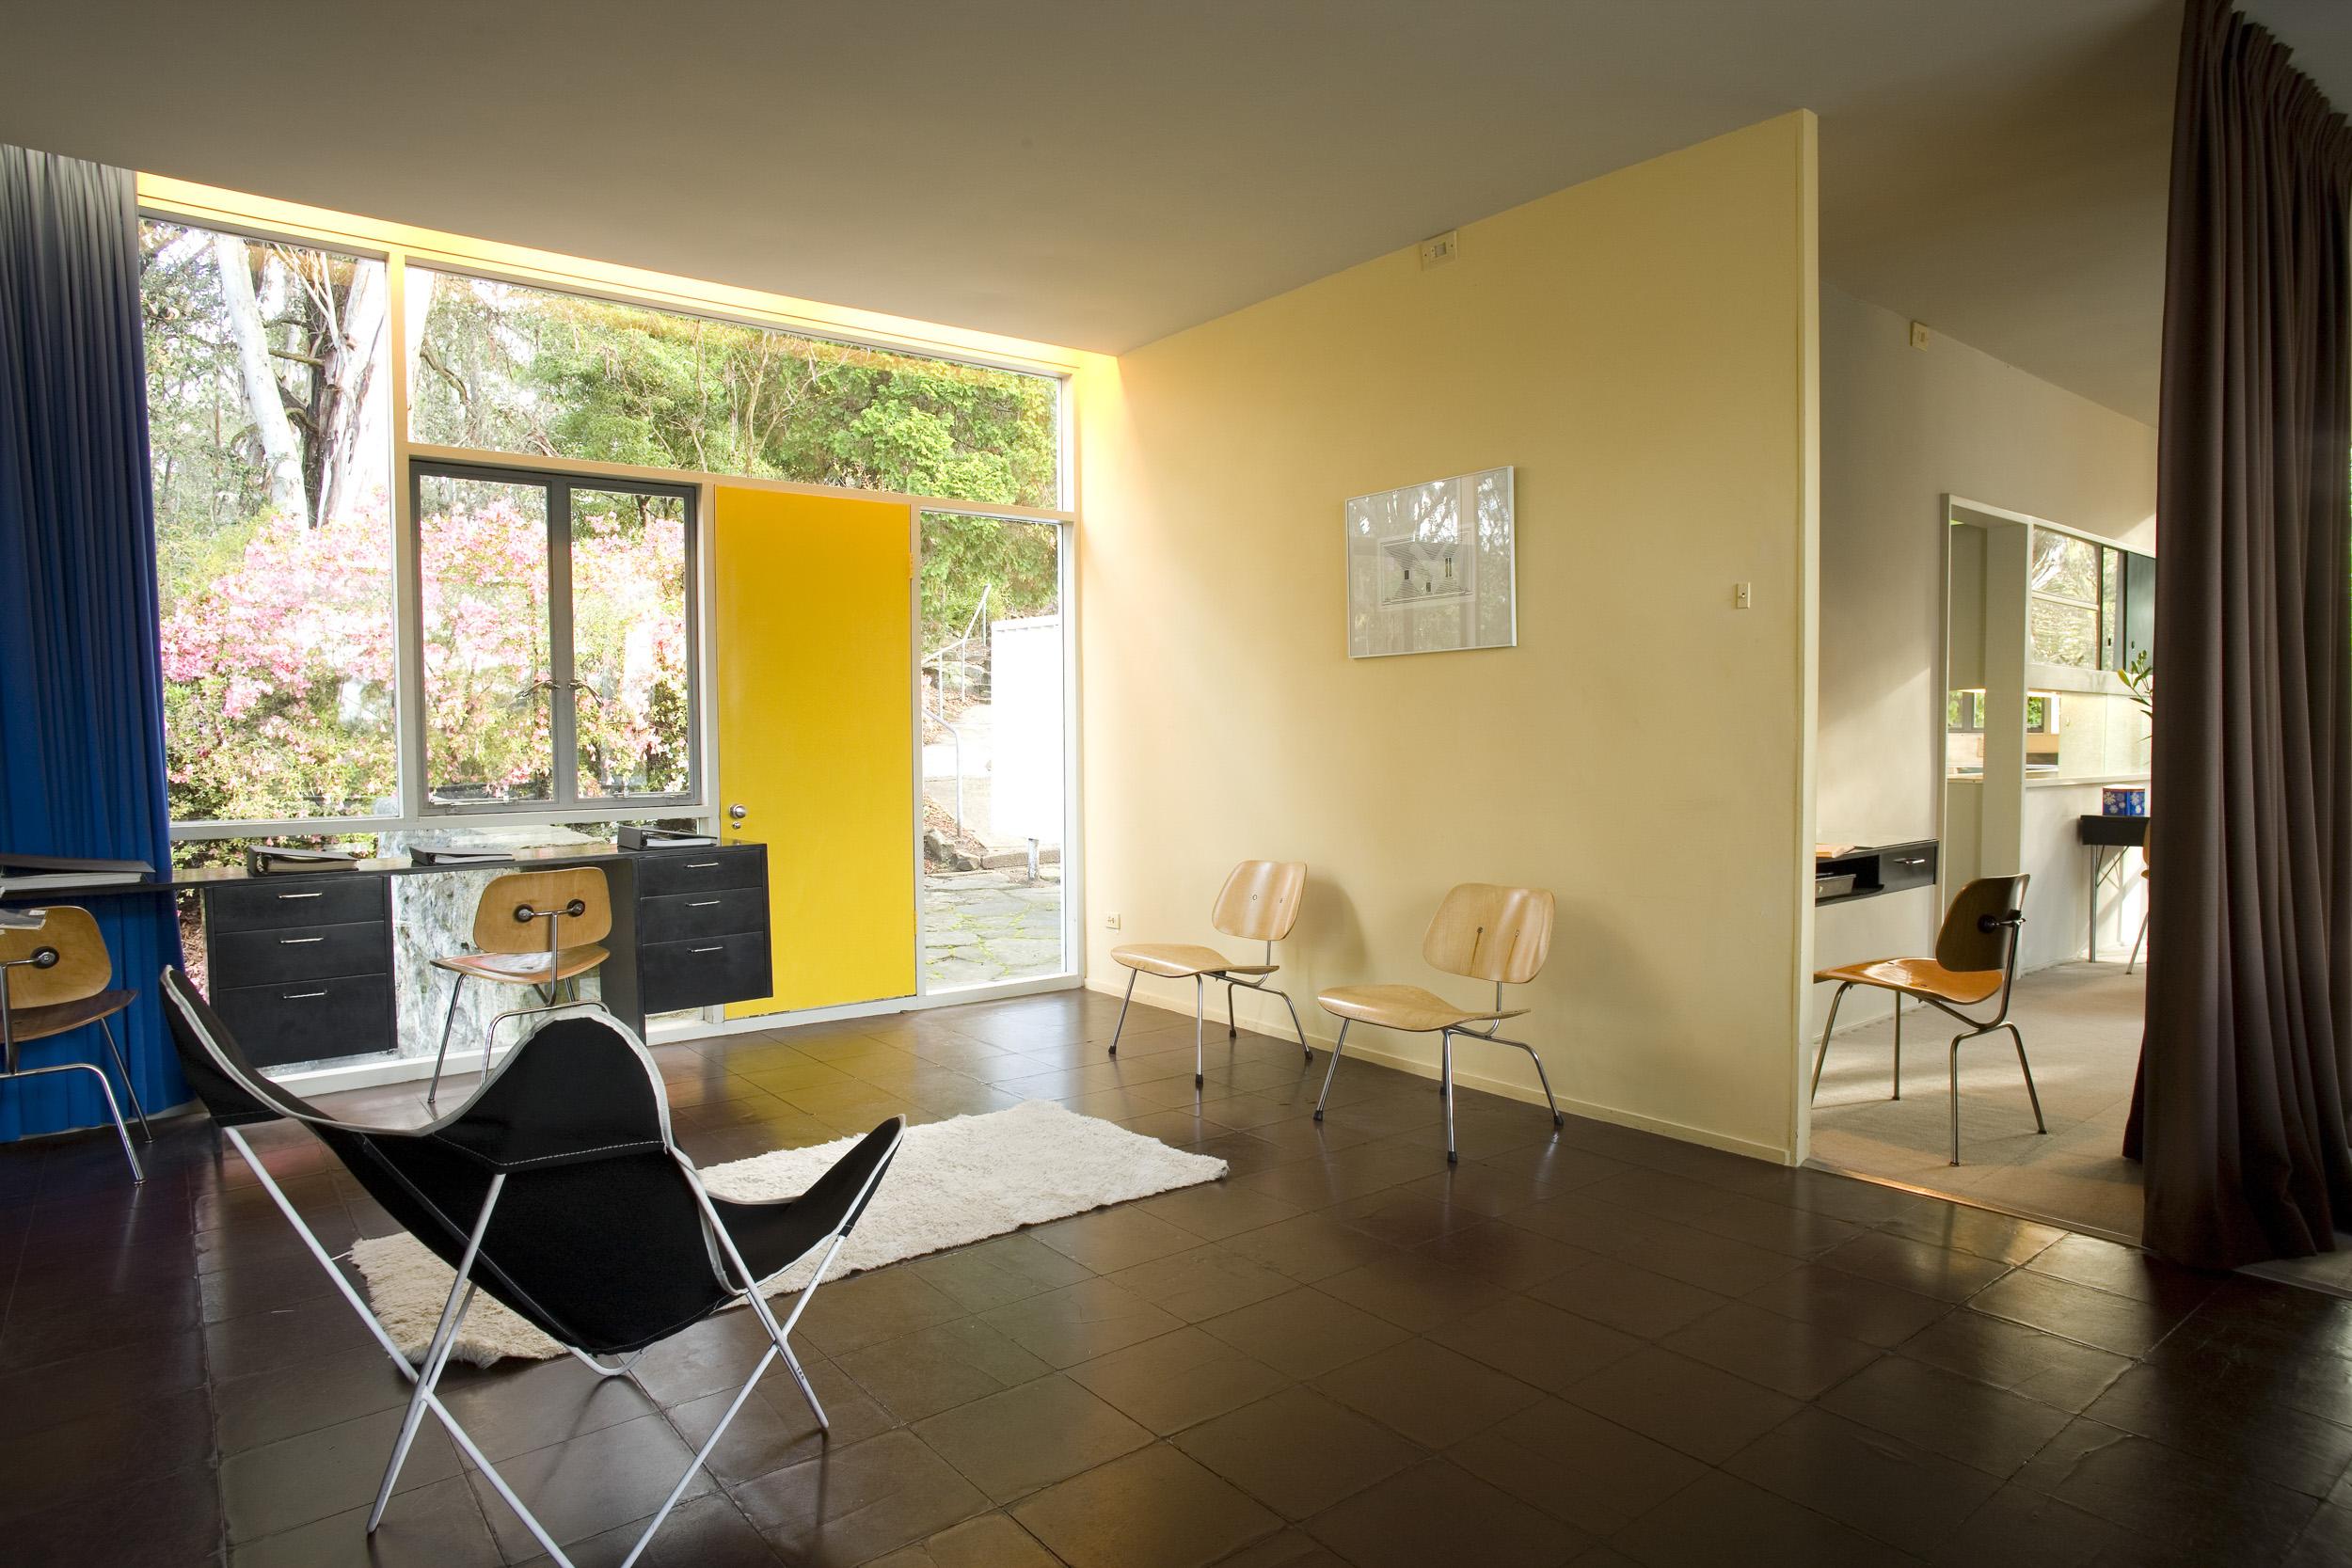 harry_seidler_architects_australia_05.jpg